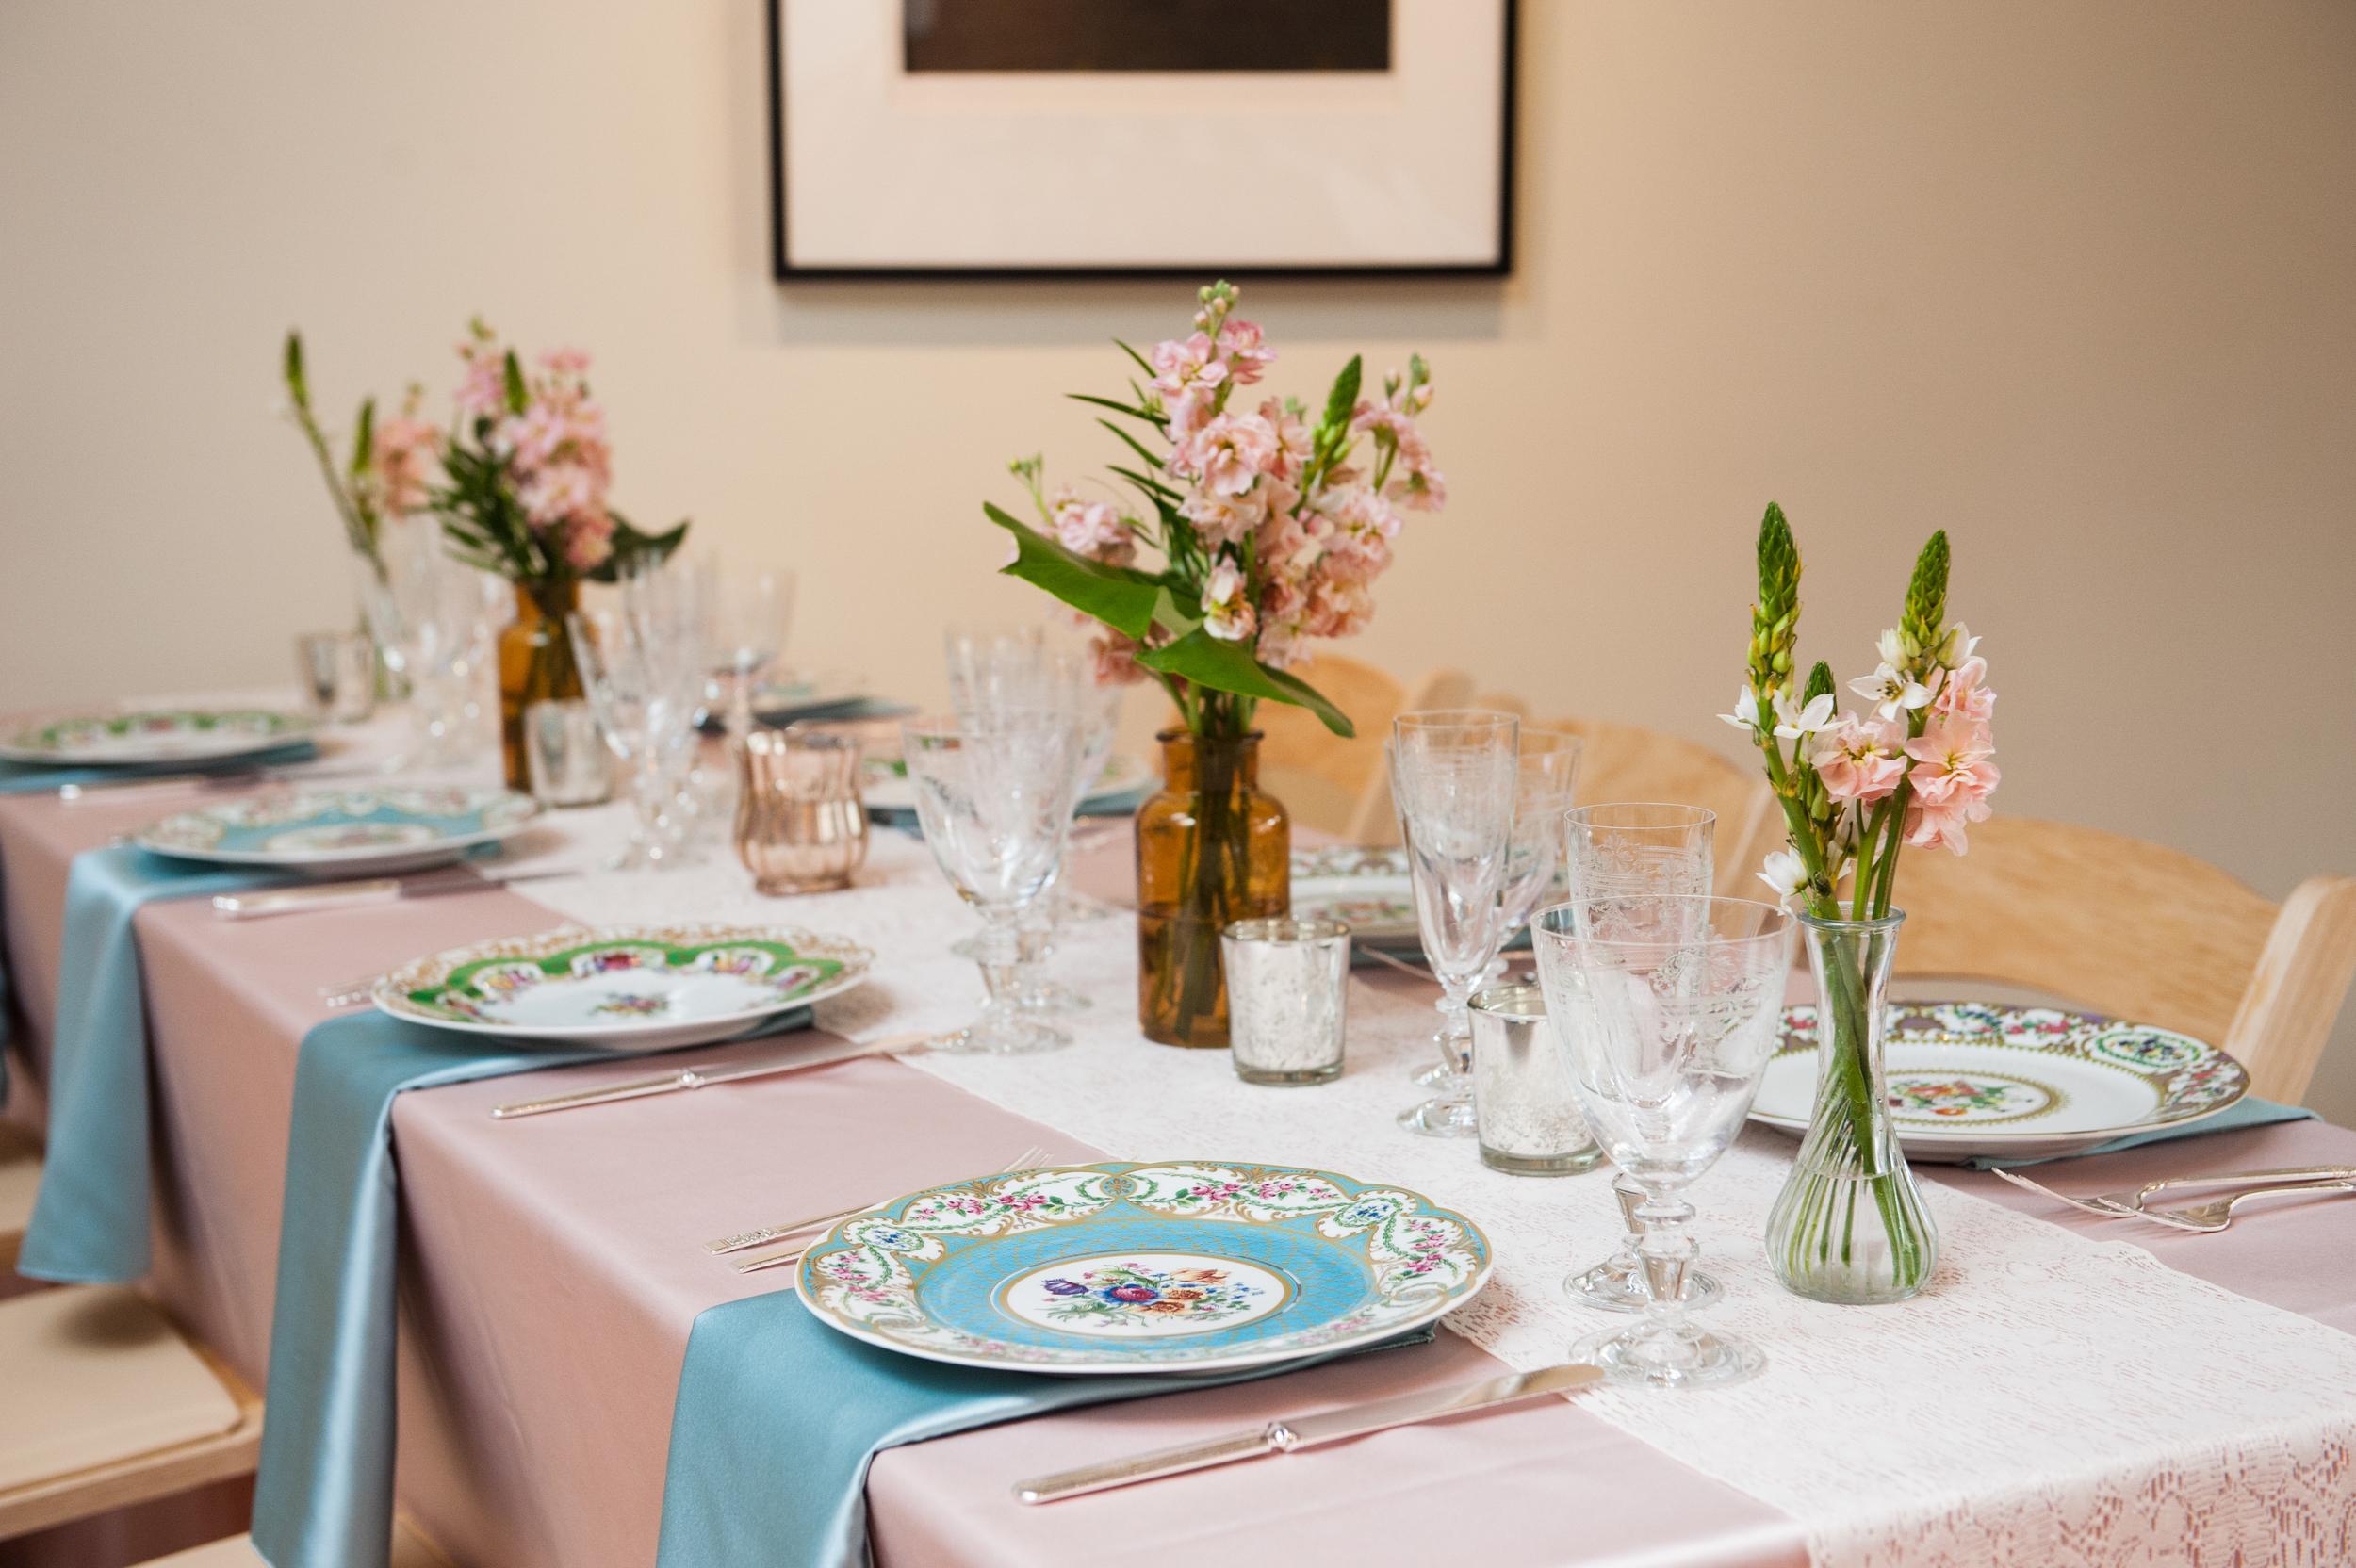 chicago wedding caterer vintage pastel place setting-8.jpg